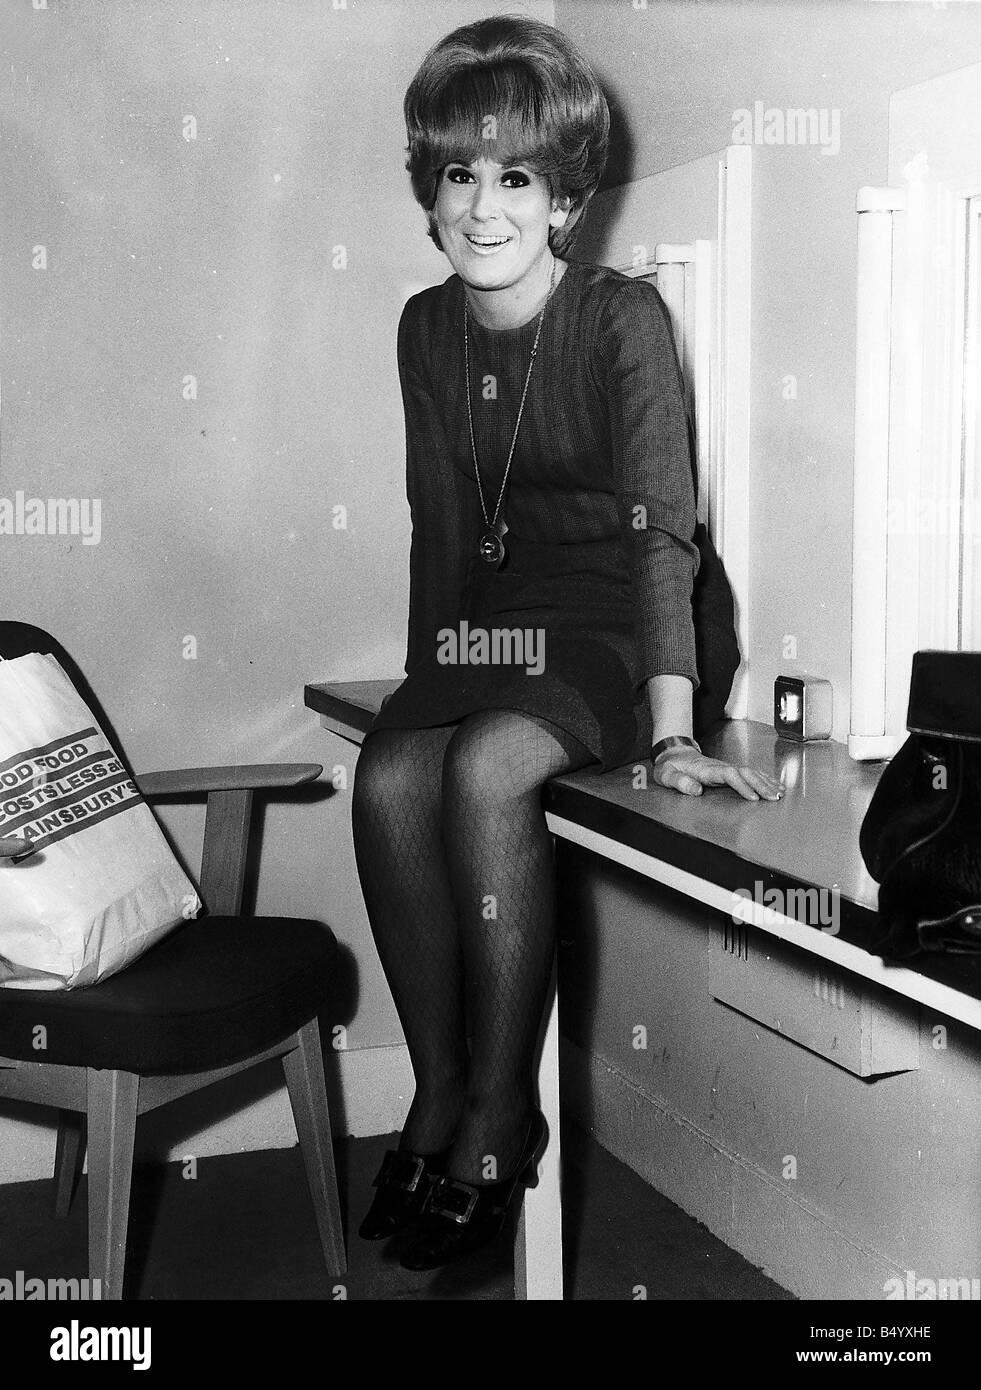 Dusty Springfield singer - Stock Image